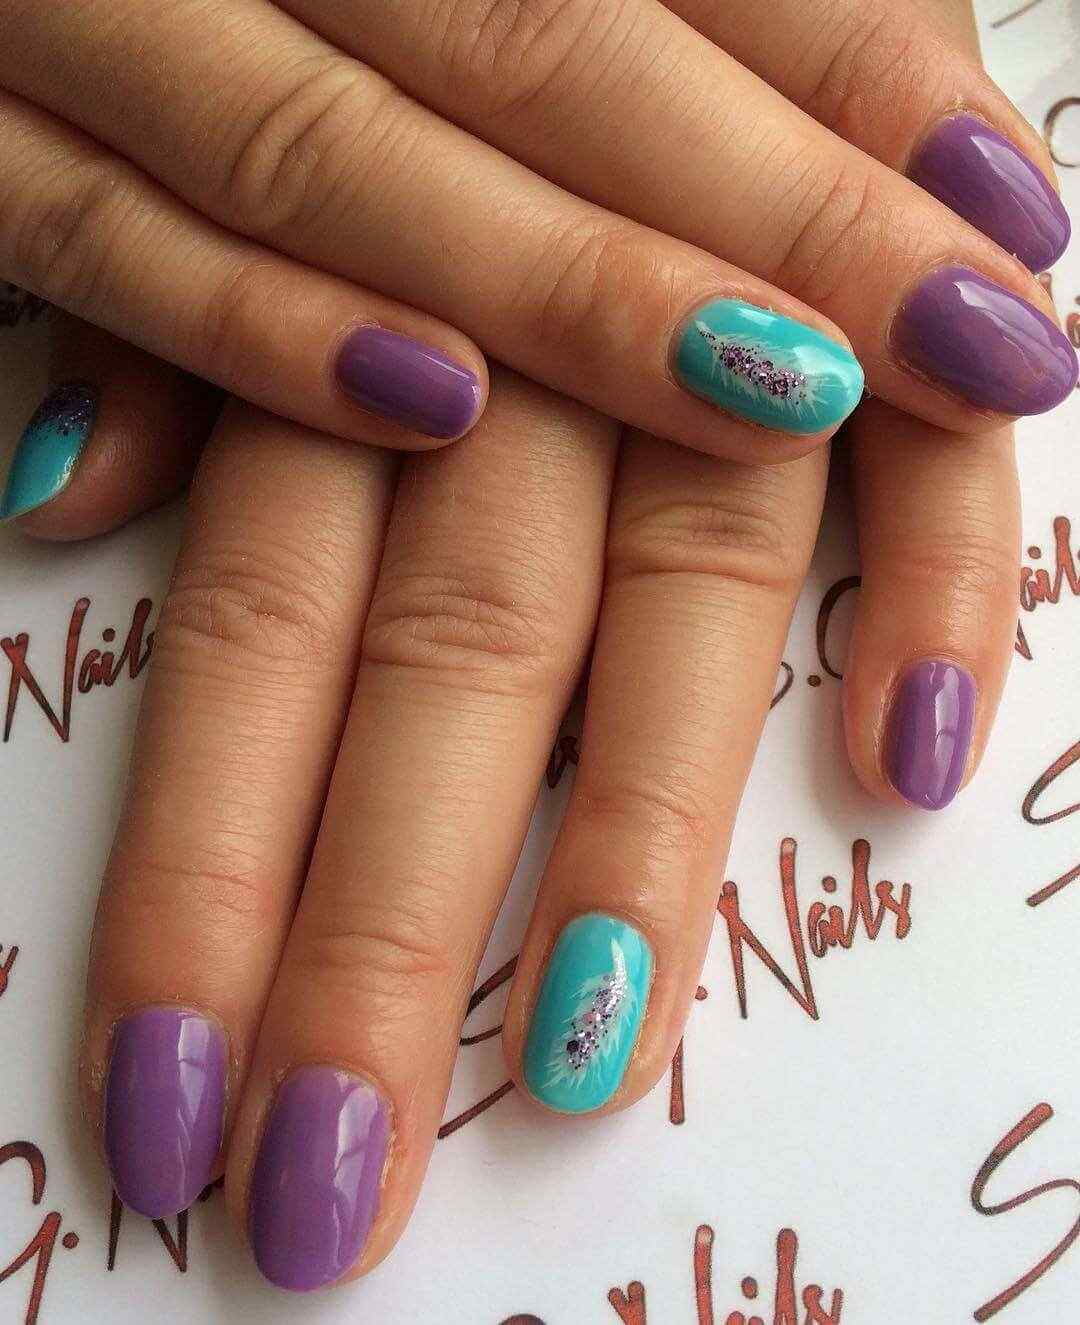 U as violetas 100 dise os espectaculares - Disenos de unas decoradas ...